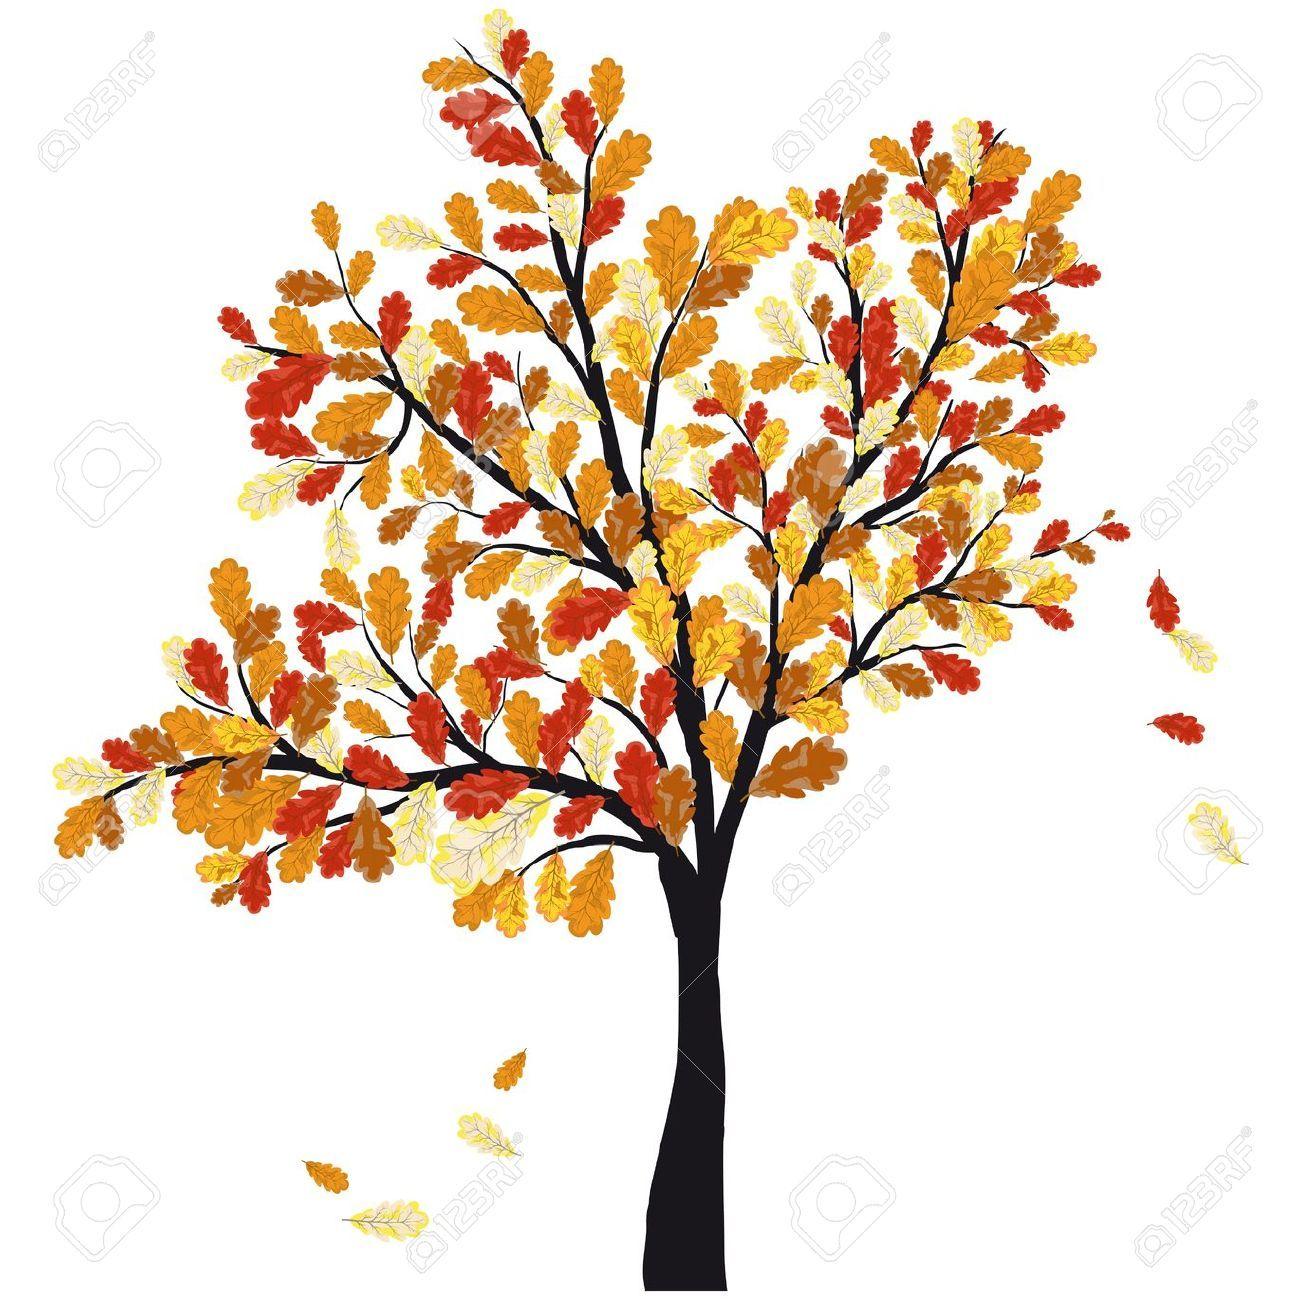 14970481 autumn oak tree with falling leaves illustration stock rh pinterest com Autumn Tree Clip Art Black and White Clip Art of Autumn Scenery